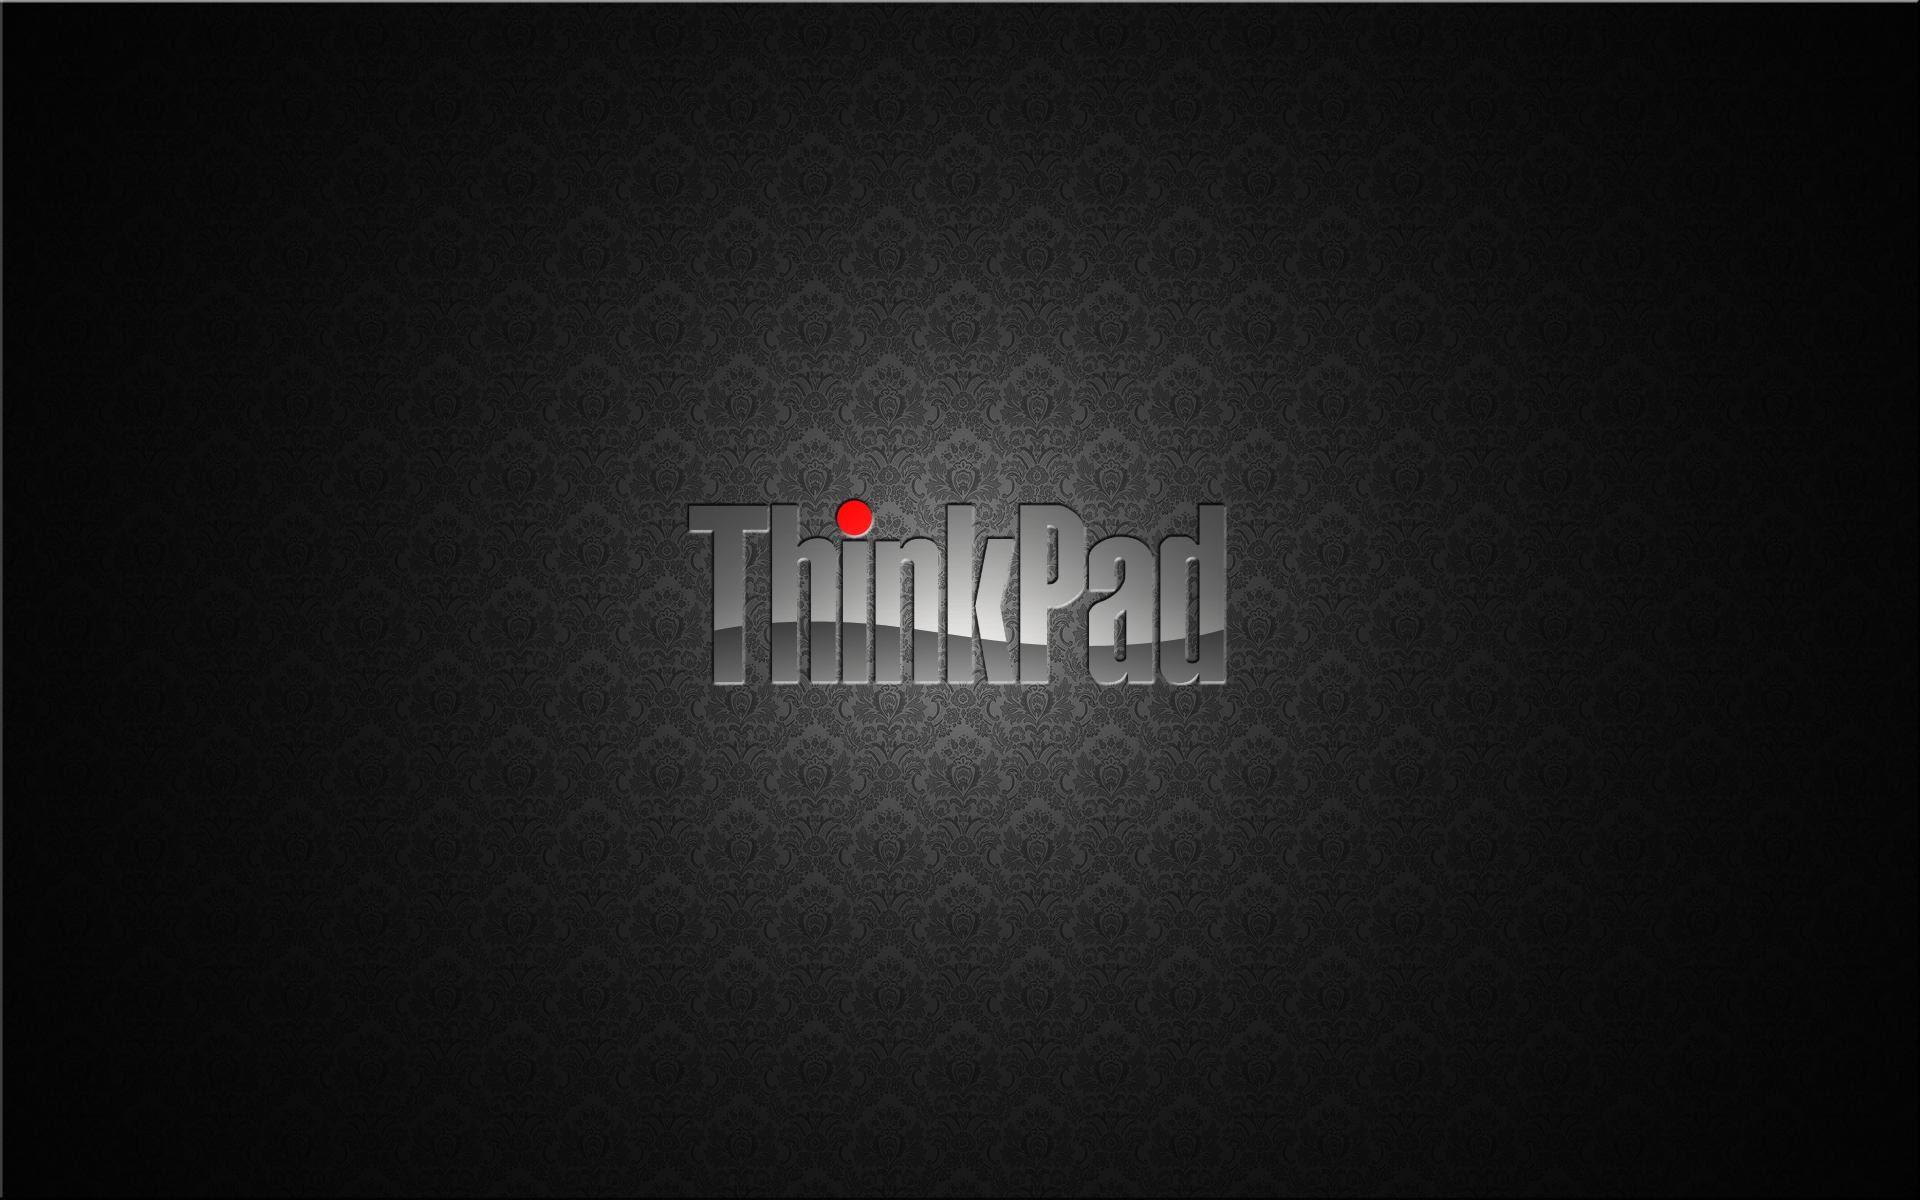 Thinkpad Wallpaper Hd 75 Images